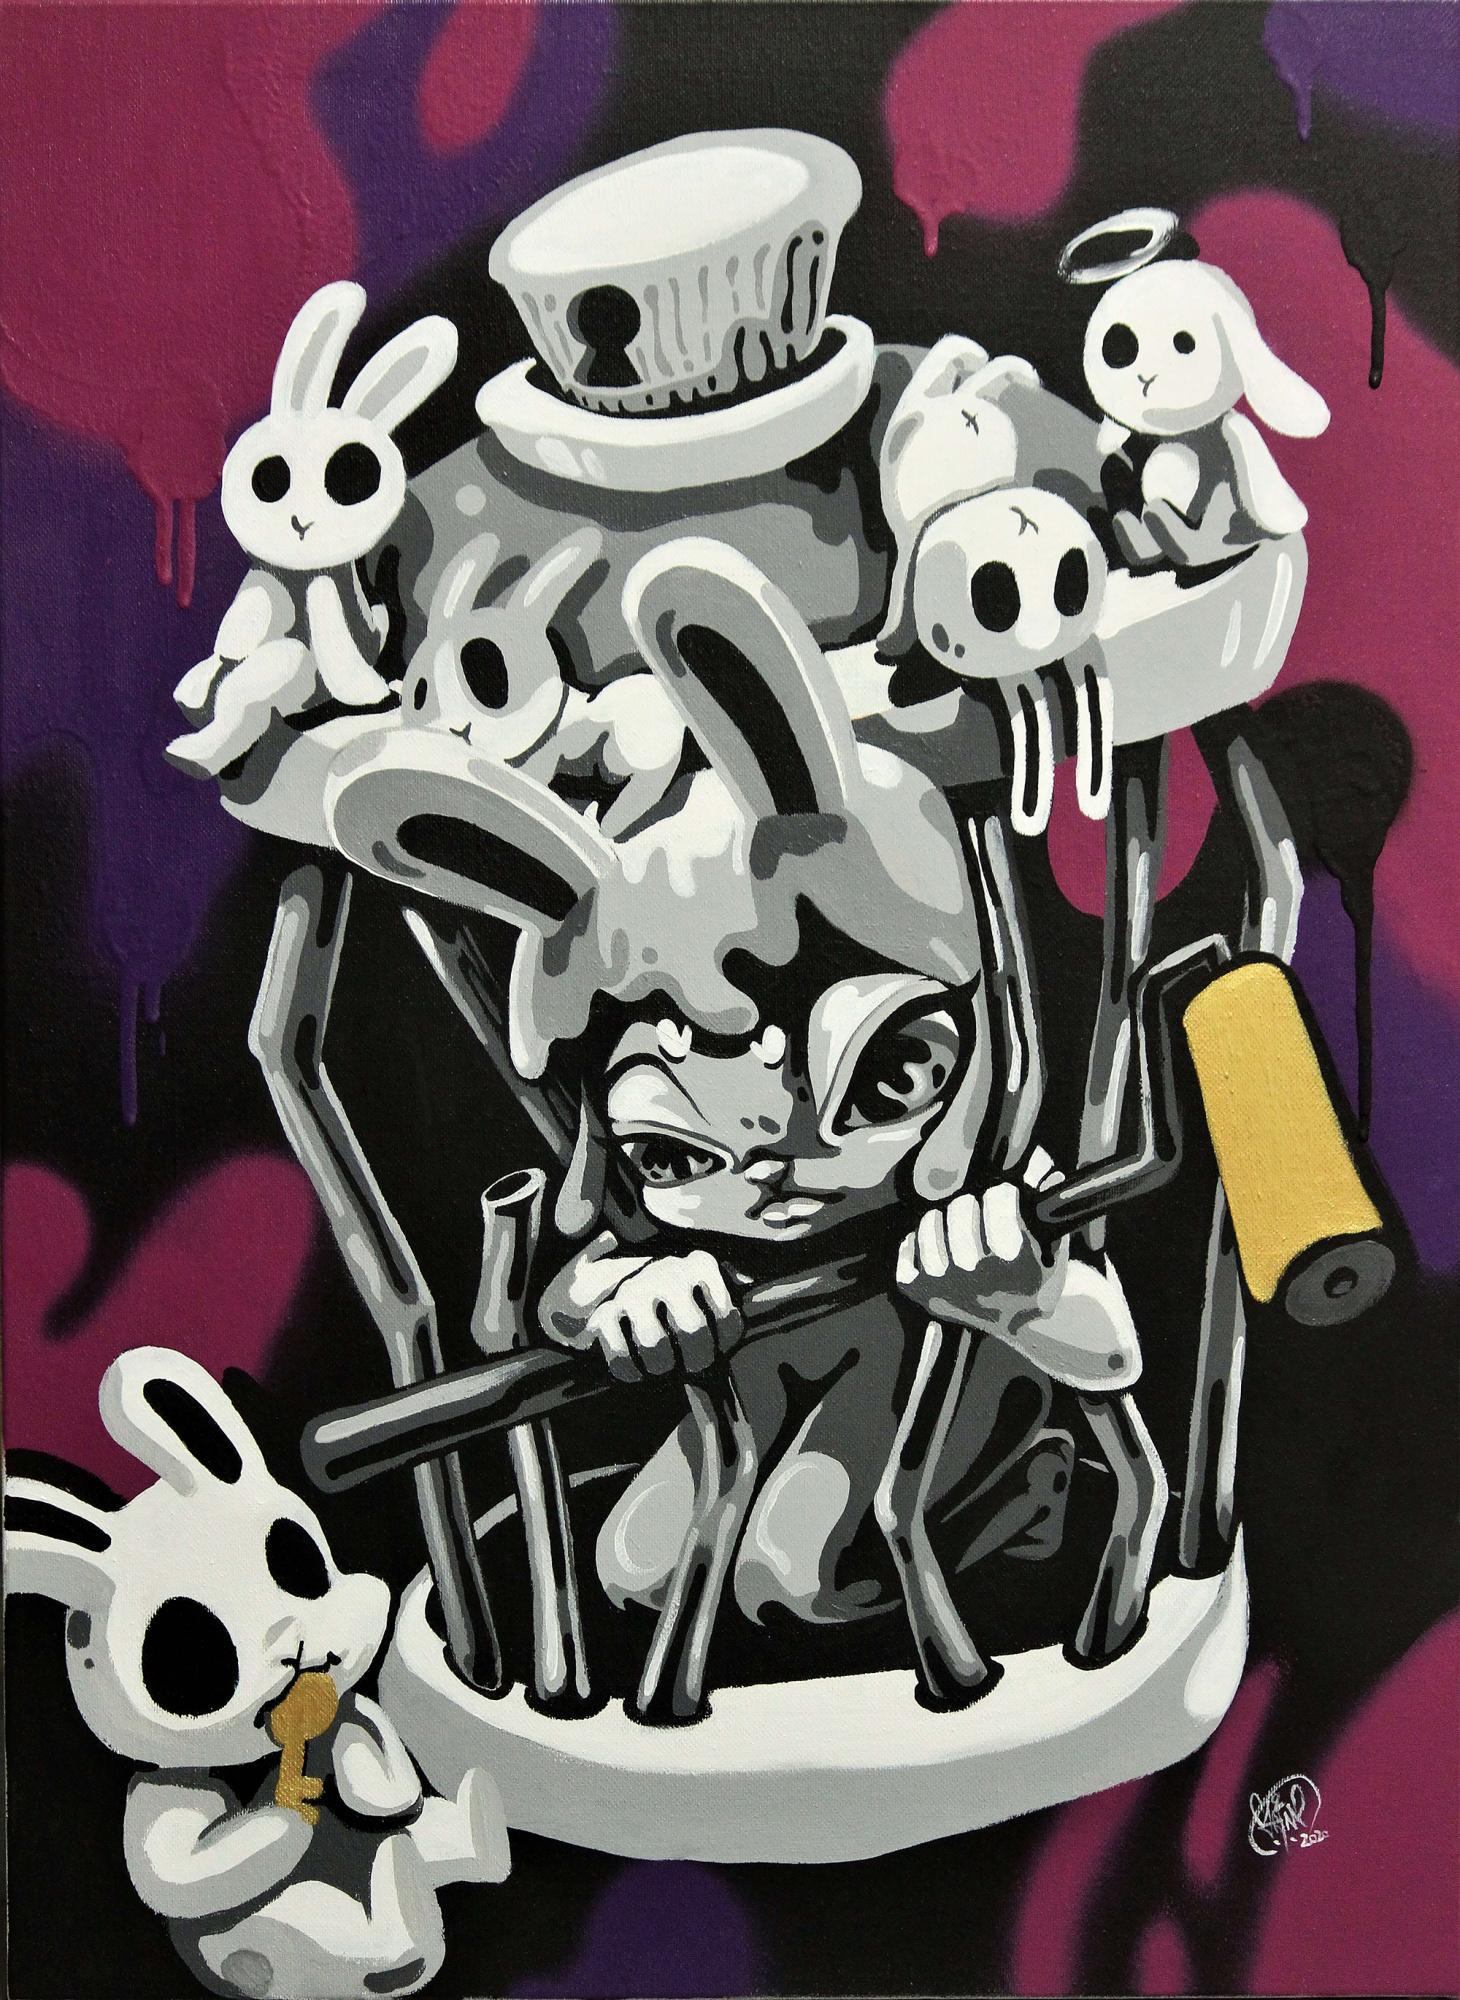 德鴻畫廊(Der-Horng Art Gallery)夢裡那兔《鎖匠(Blacksmith)》